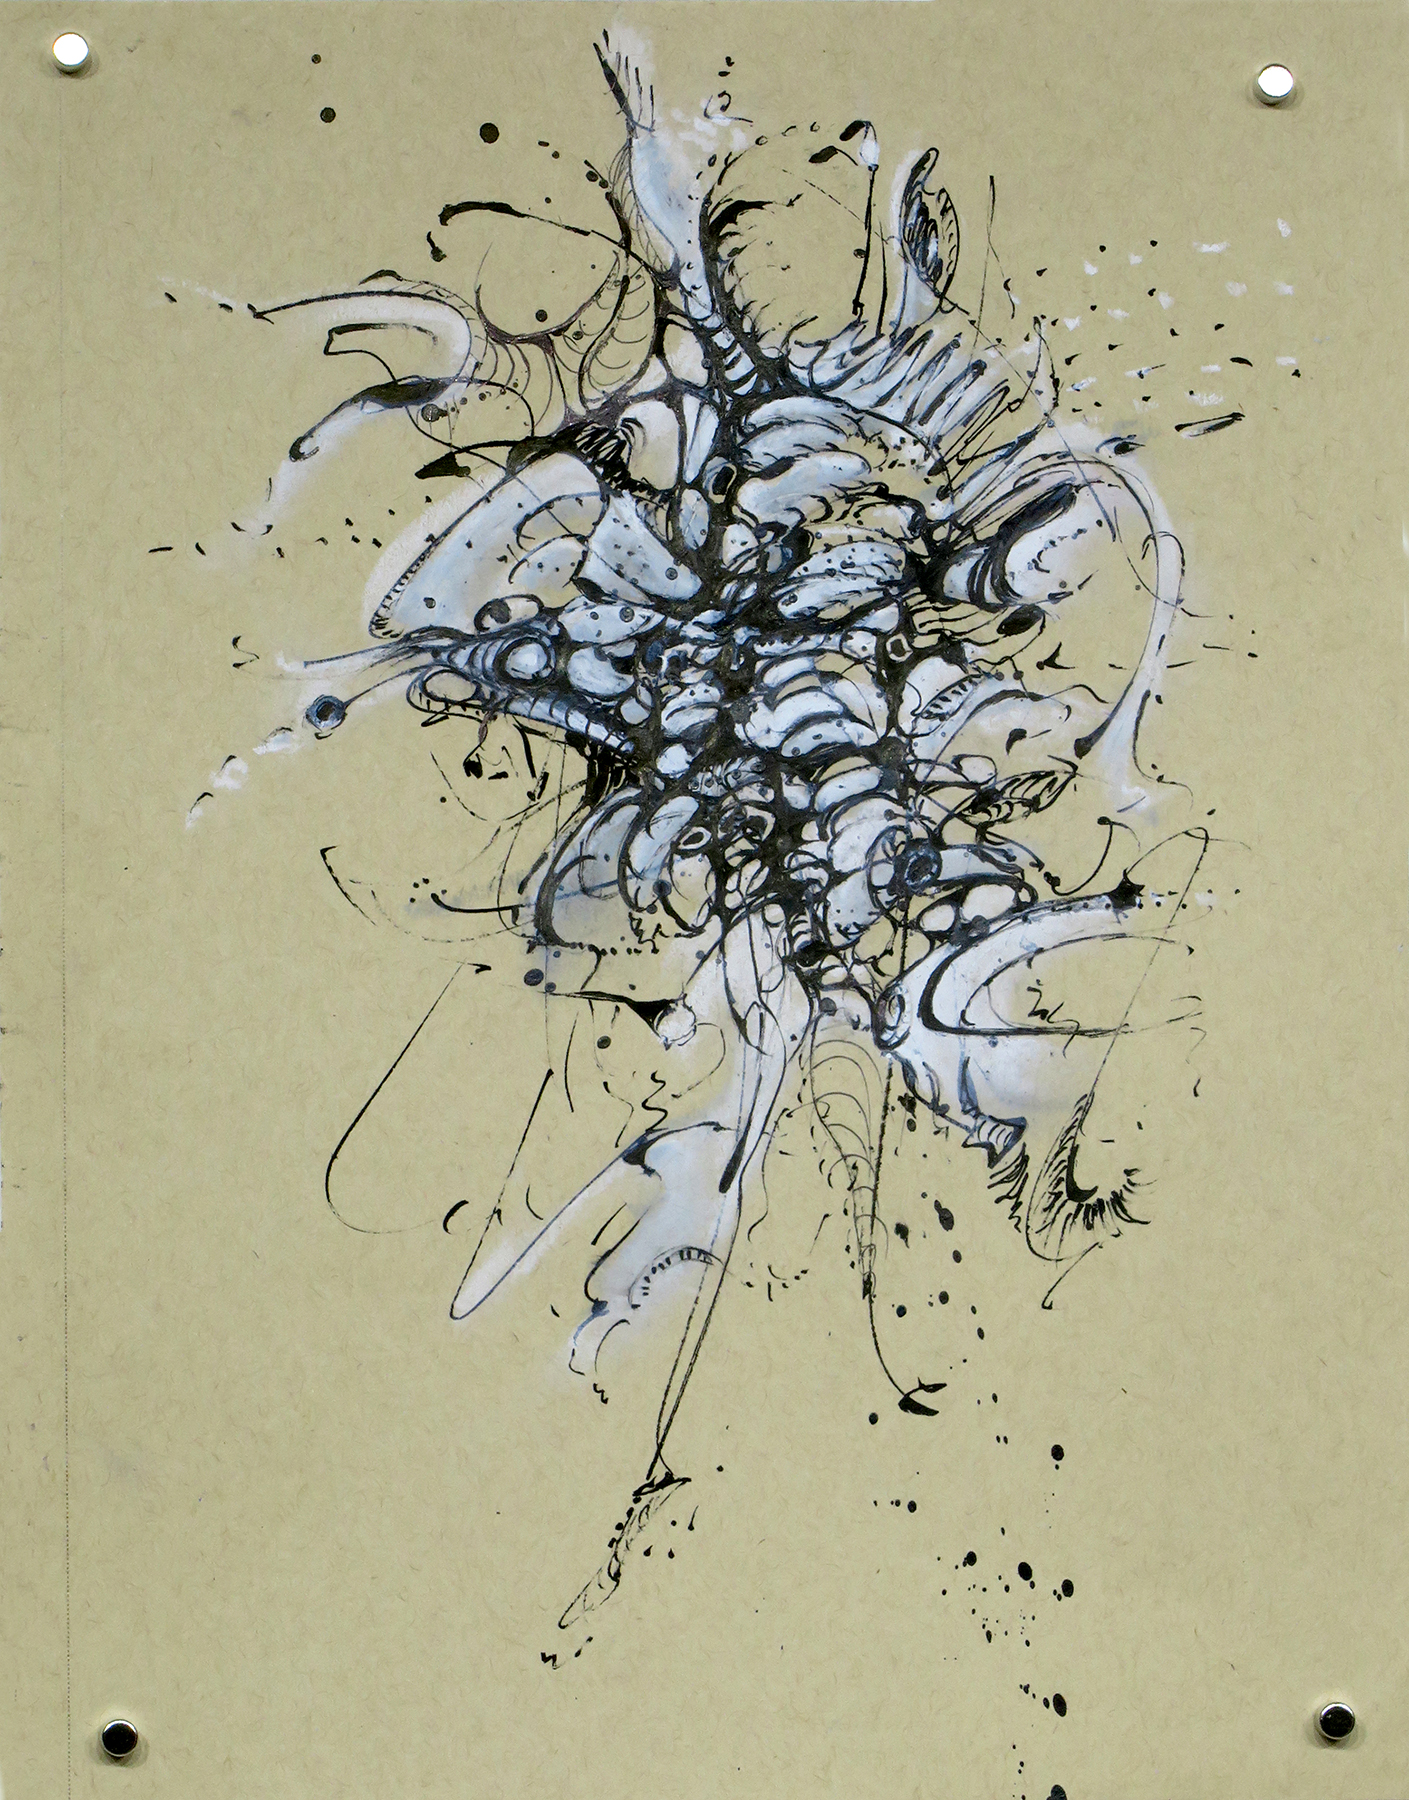 Kathryn Hart, Daunting Transitions, Krakow, Ink Drawing 4